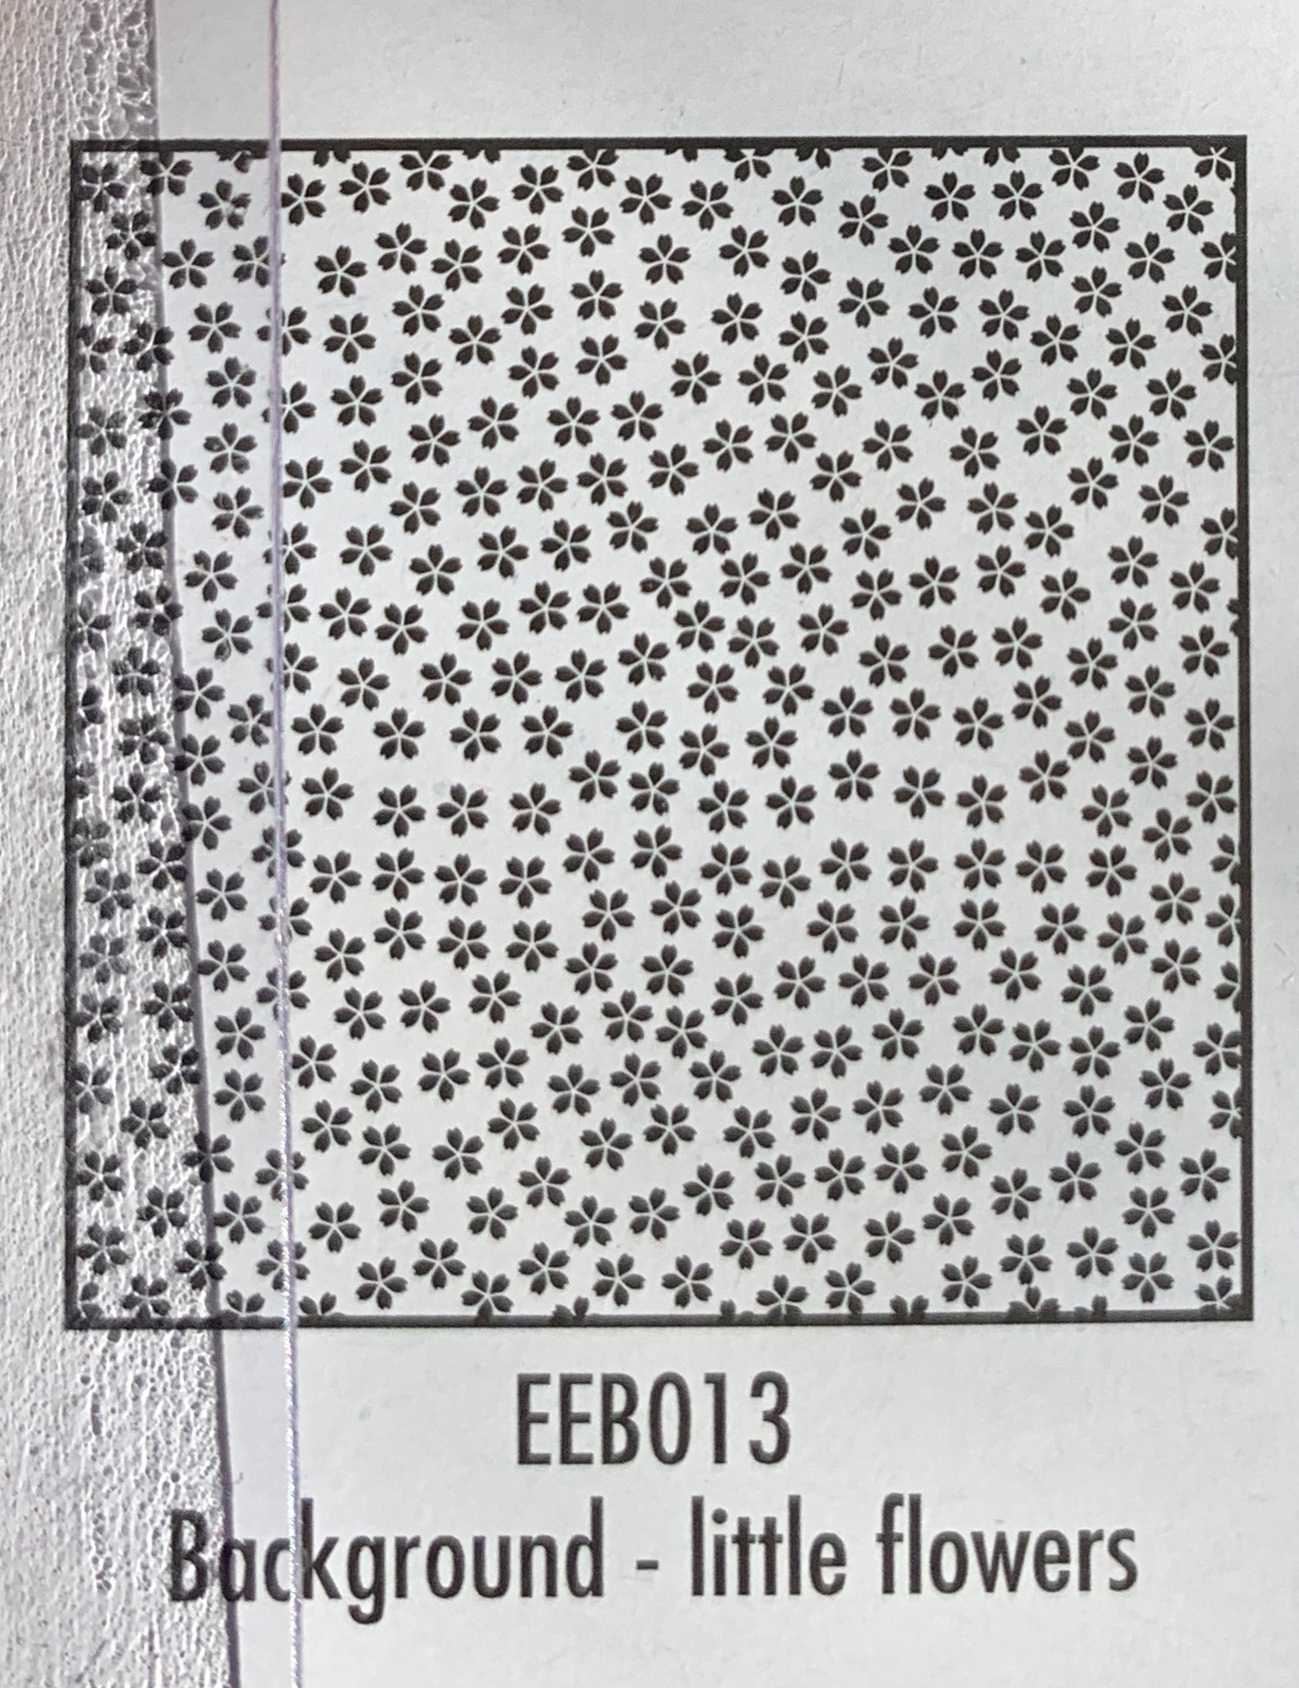 8925CF20-E185-4C8D-9D89-B601454D5DCE